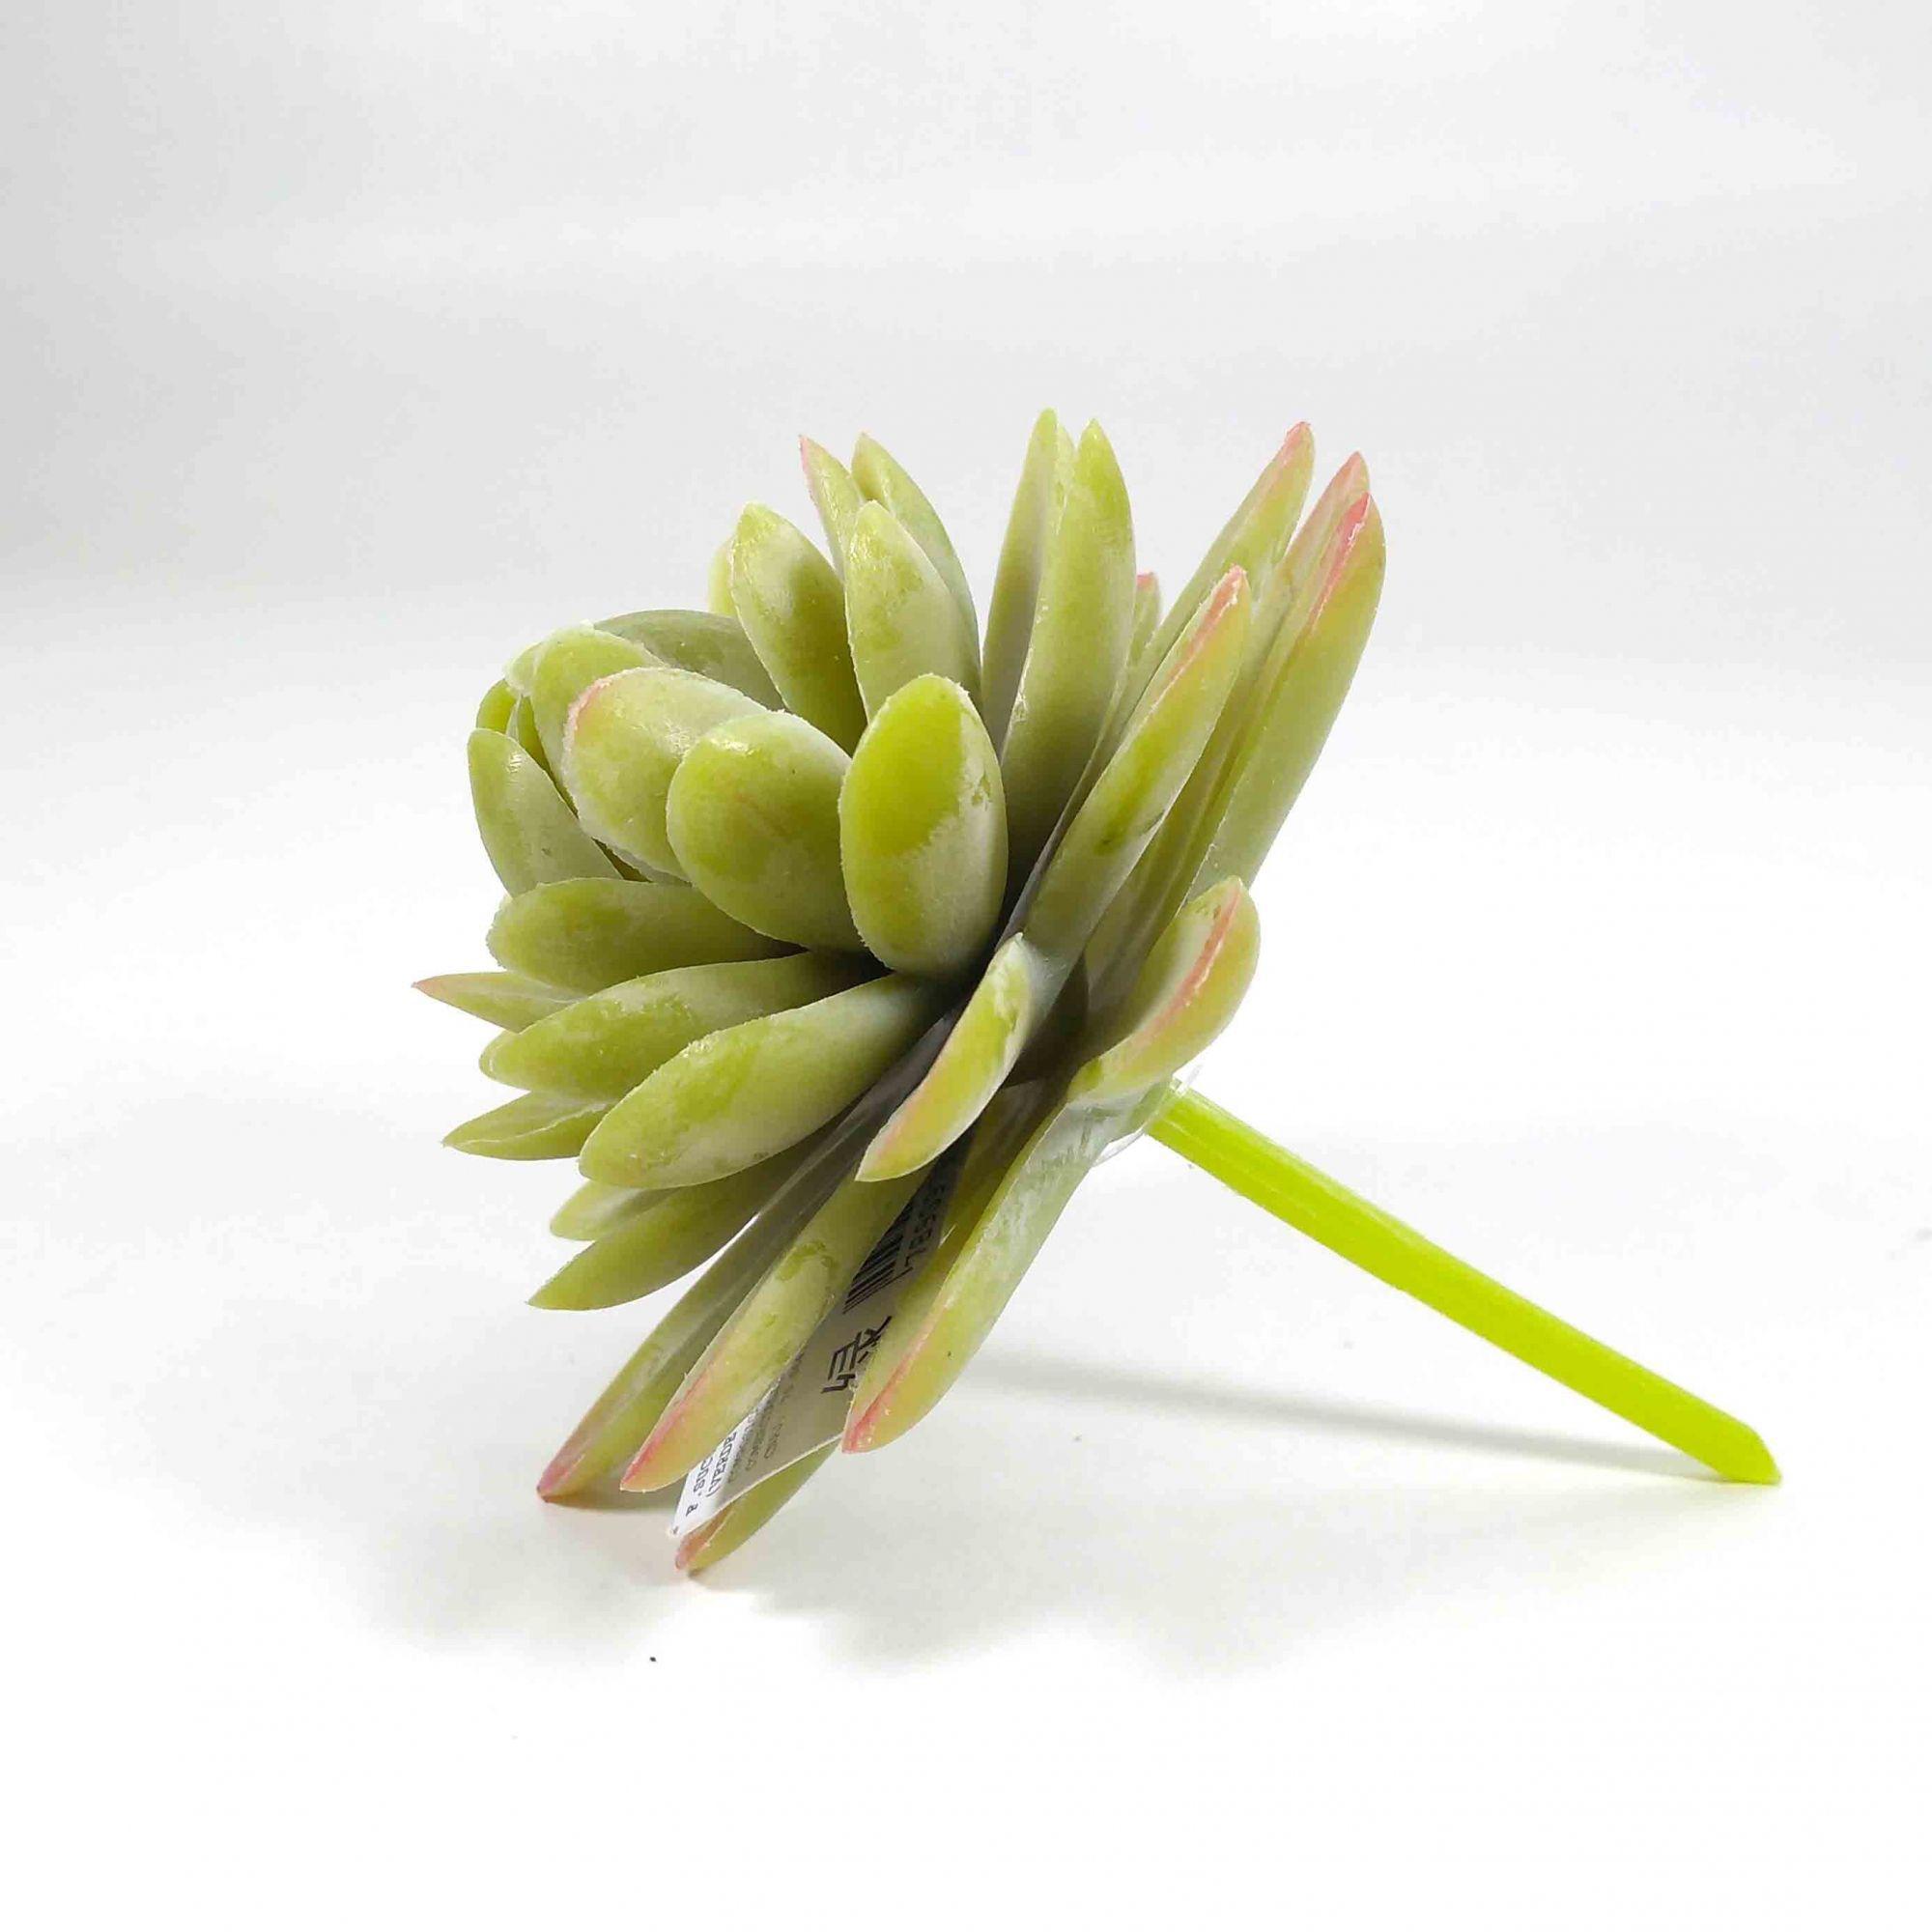 Kit 3 Vasos Cimento Preto/Cobre + Flor Suculenta